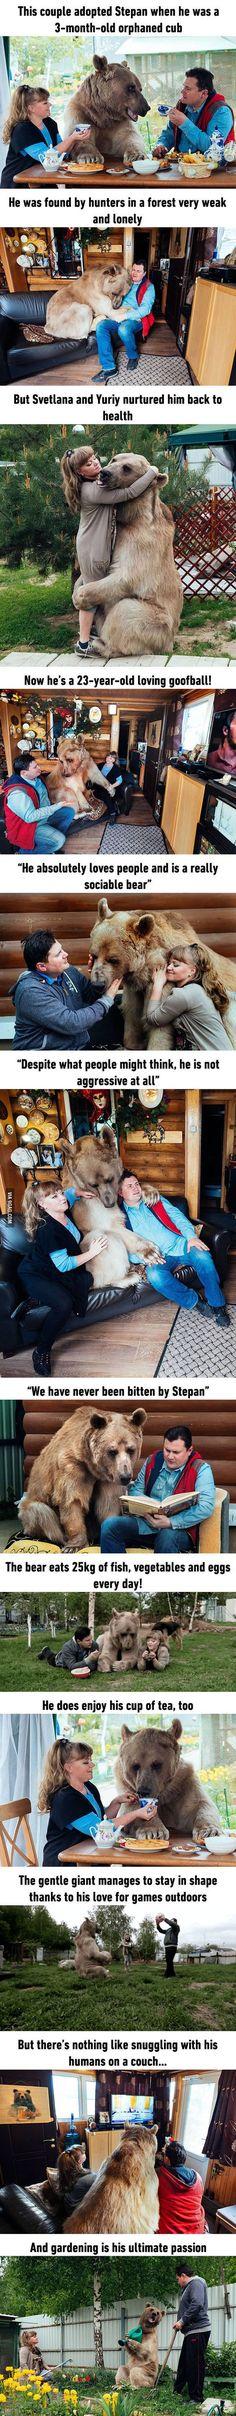 Stepan the bear